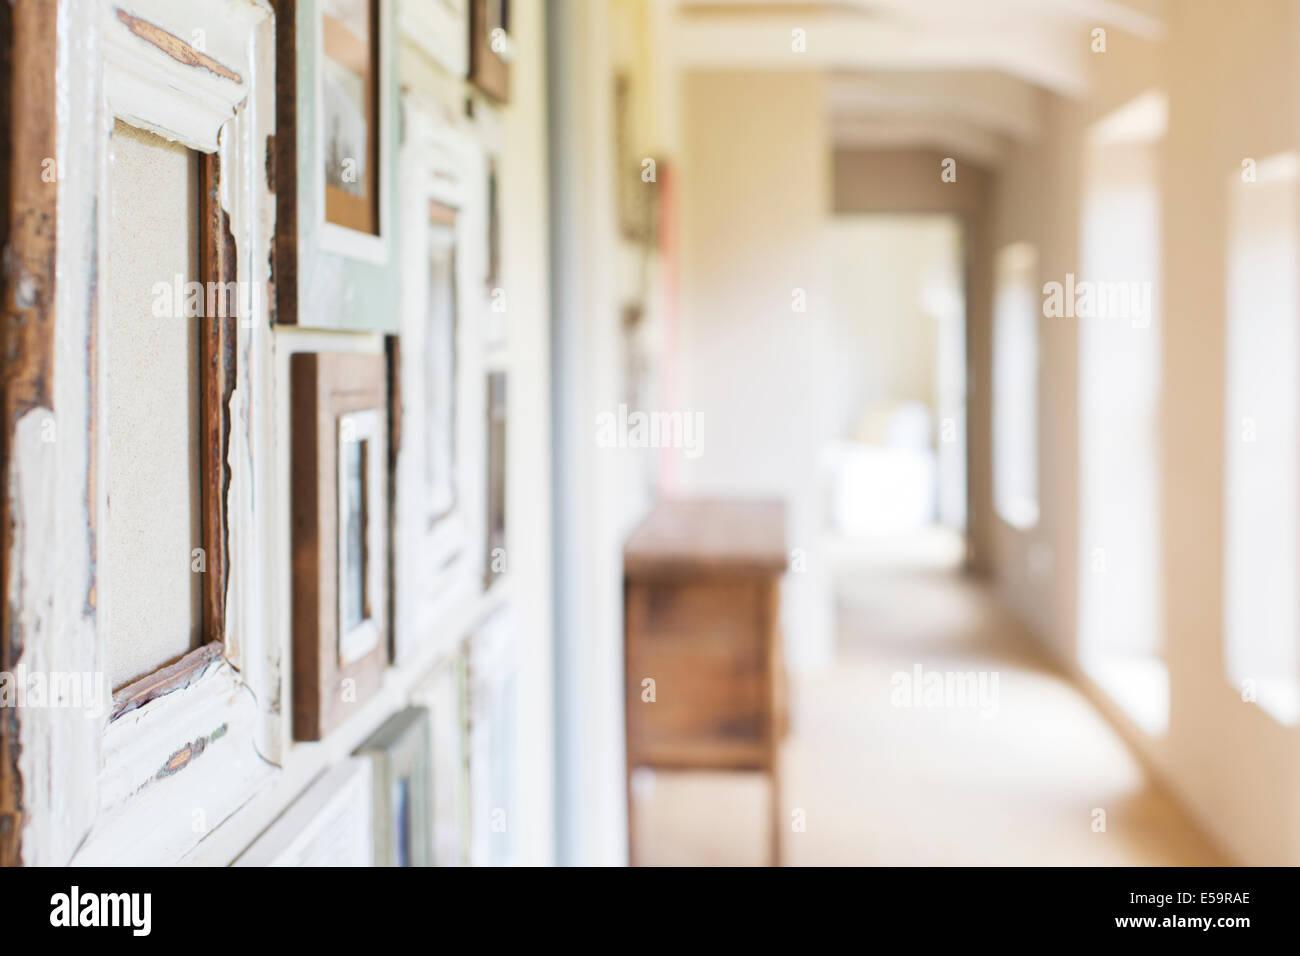 Marcos de pared decorativos en rústicas pasillo Imagen De Stock